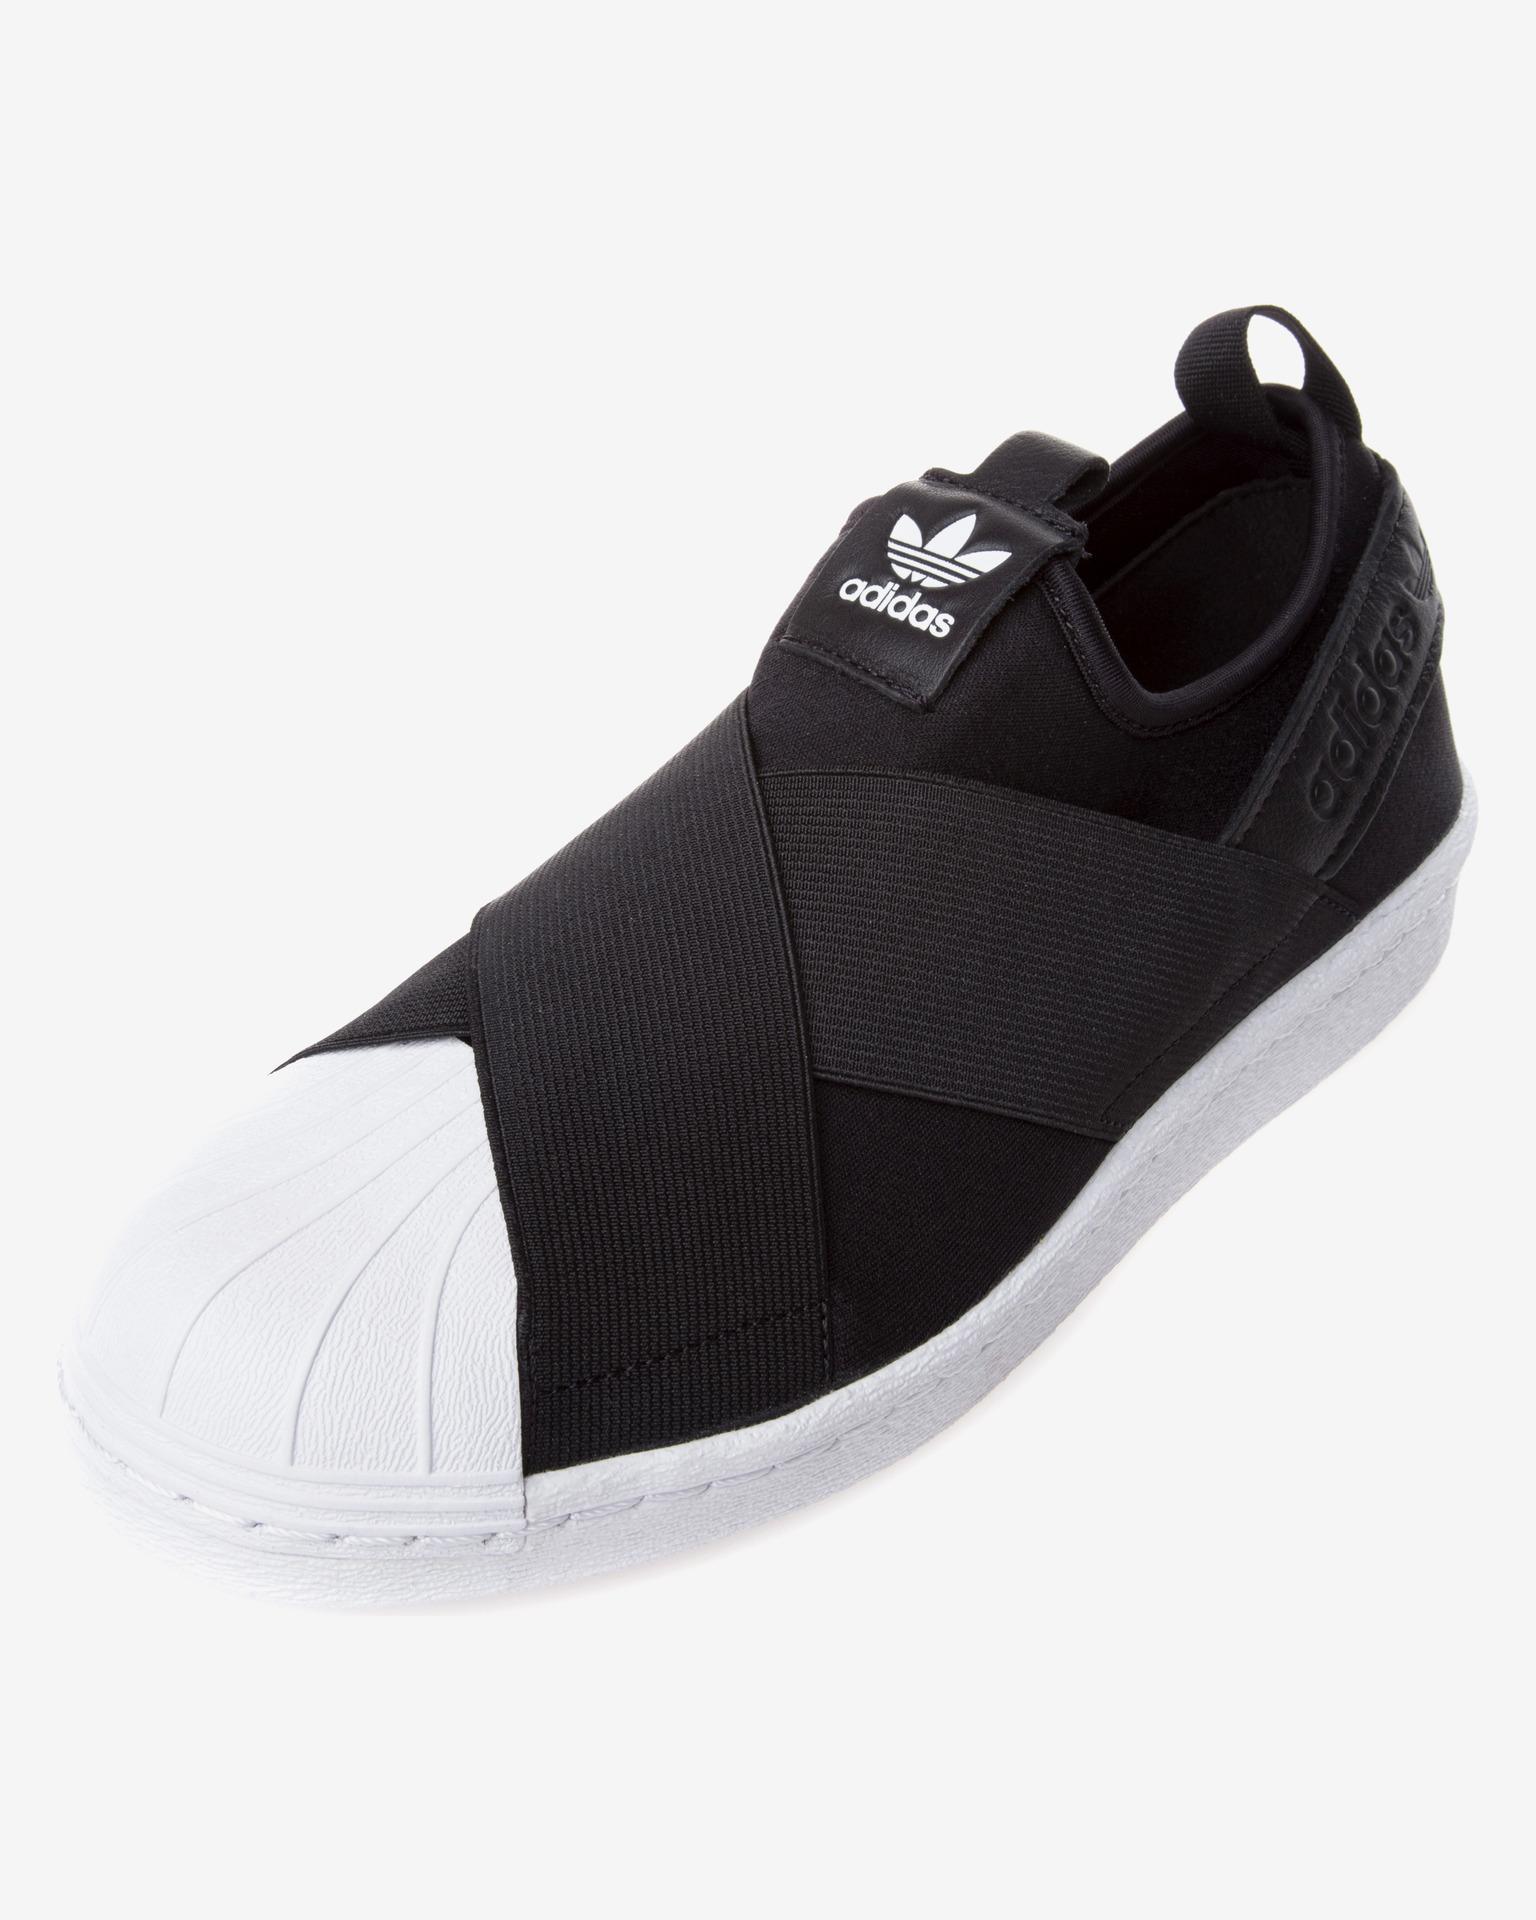 adidas Originals - Superstar Slip On Bibloo.com